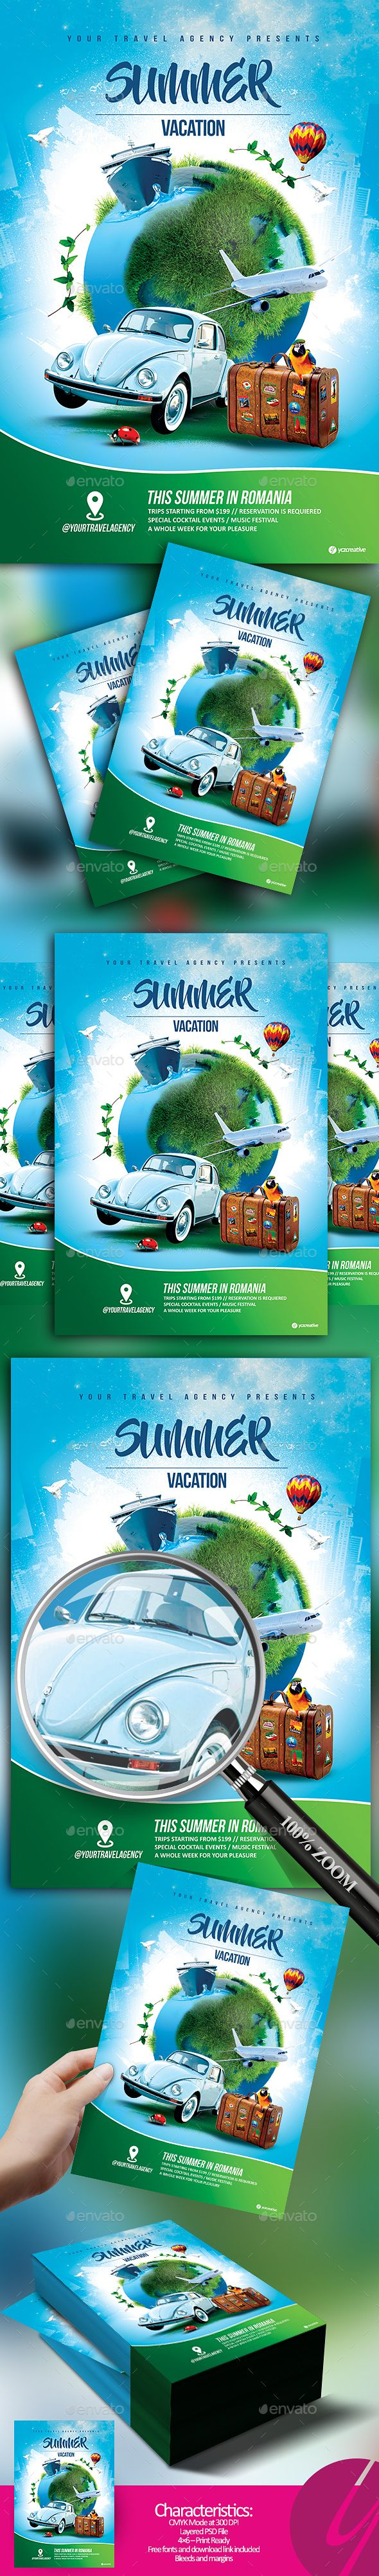 Summer Vacation Travel Flyer — Photoshop PSD #safari #europe • Download ➝ https://graphicriver.net/item/summer-vacation-travel-flyer/19686665?ref=pxcr